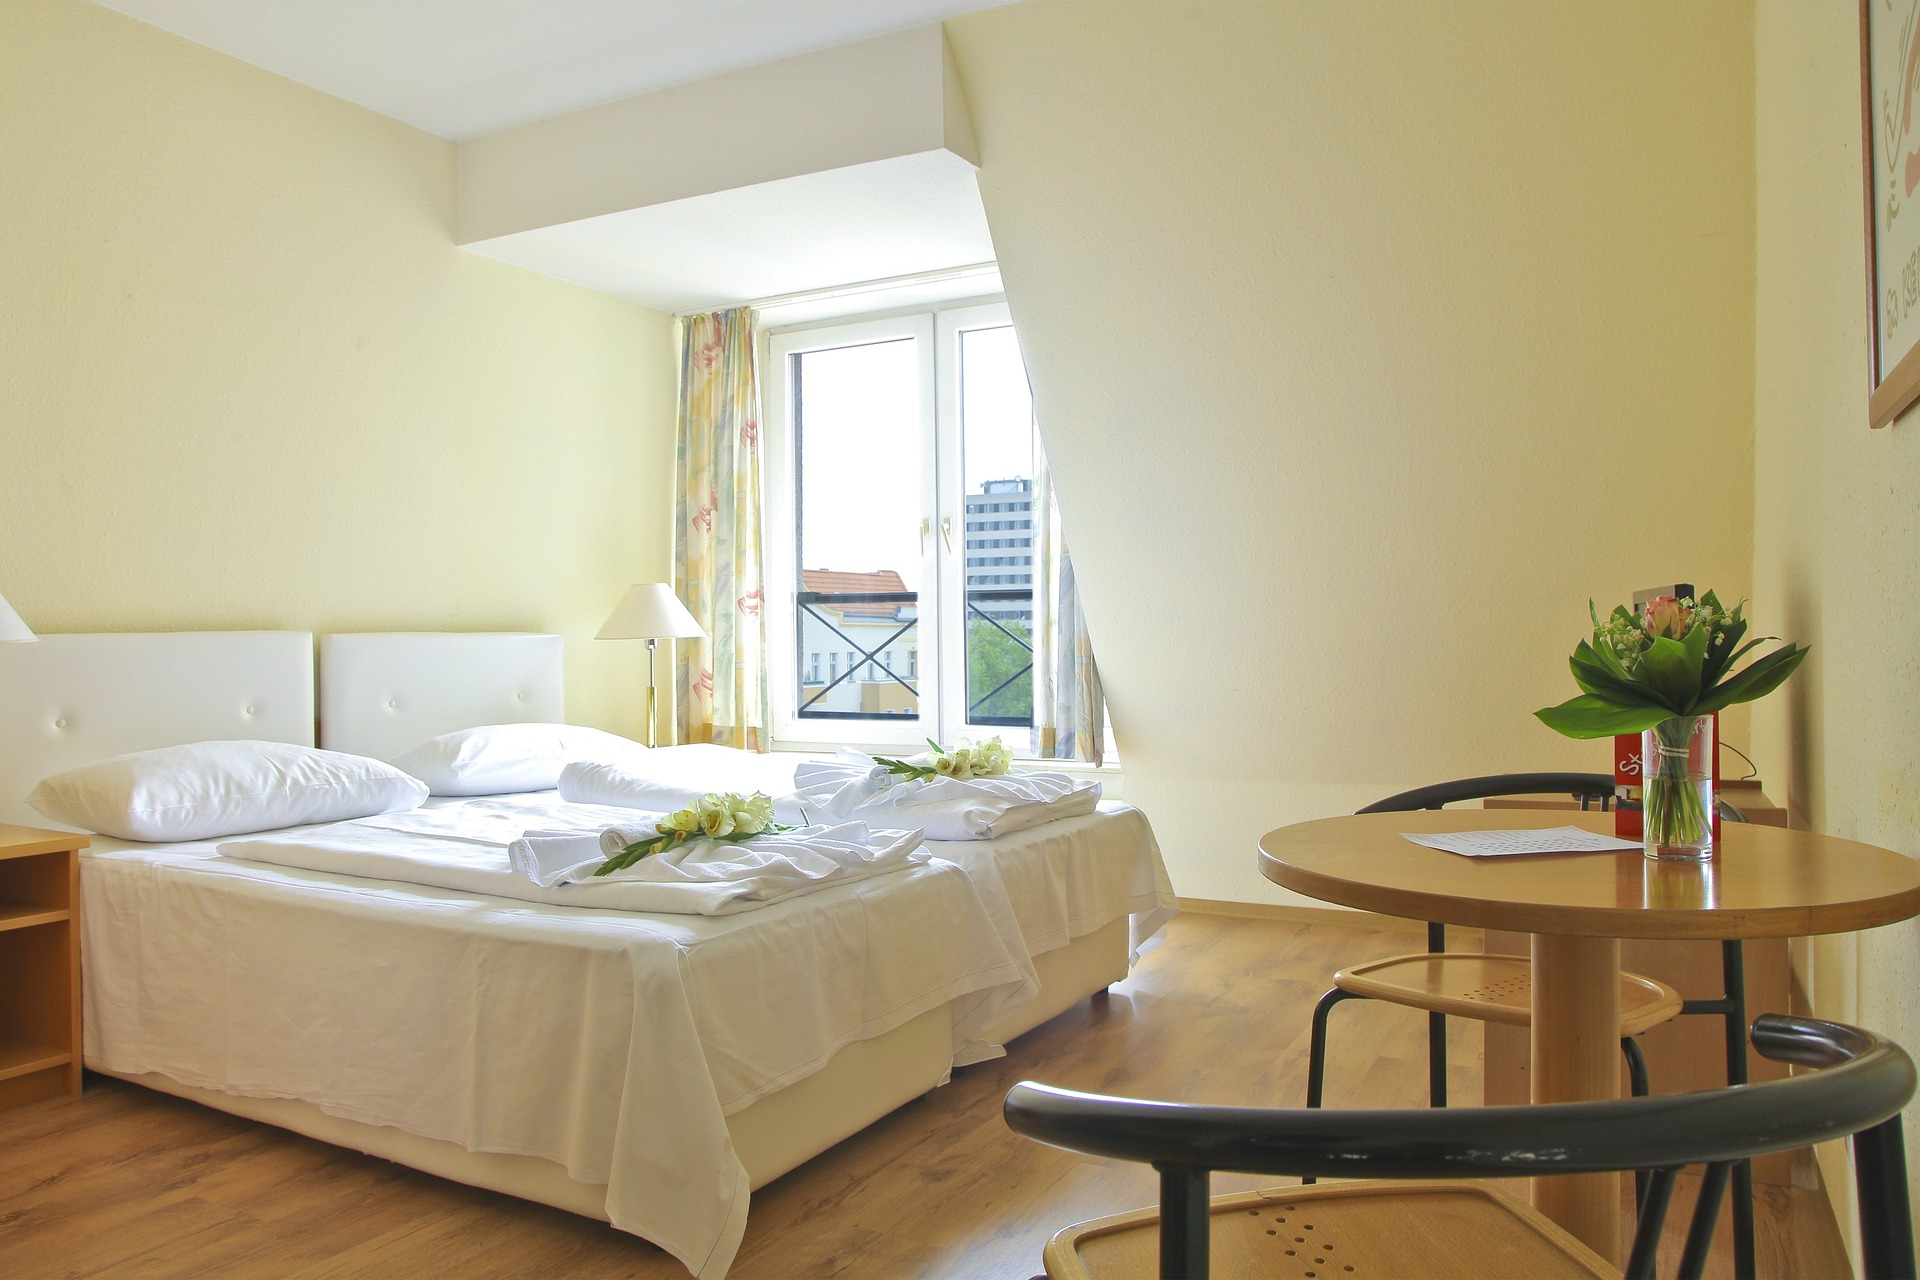 hotel-939501_1920